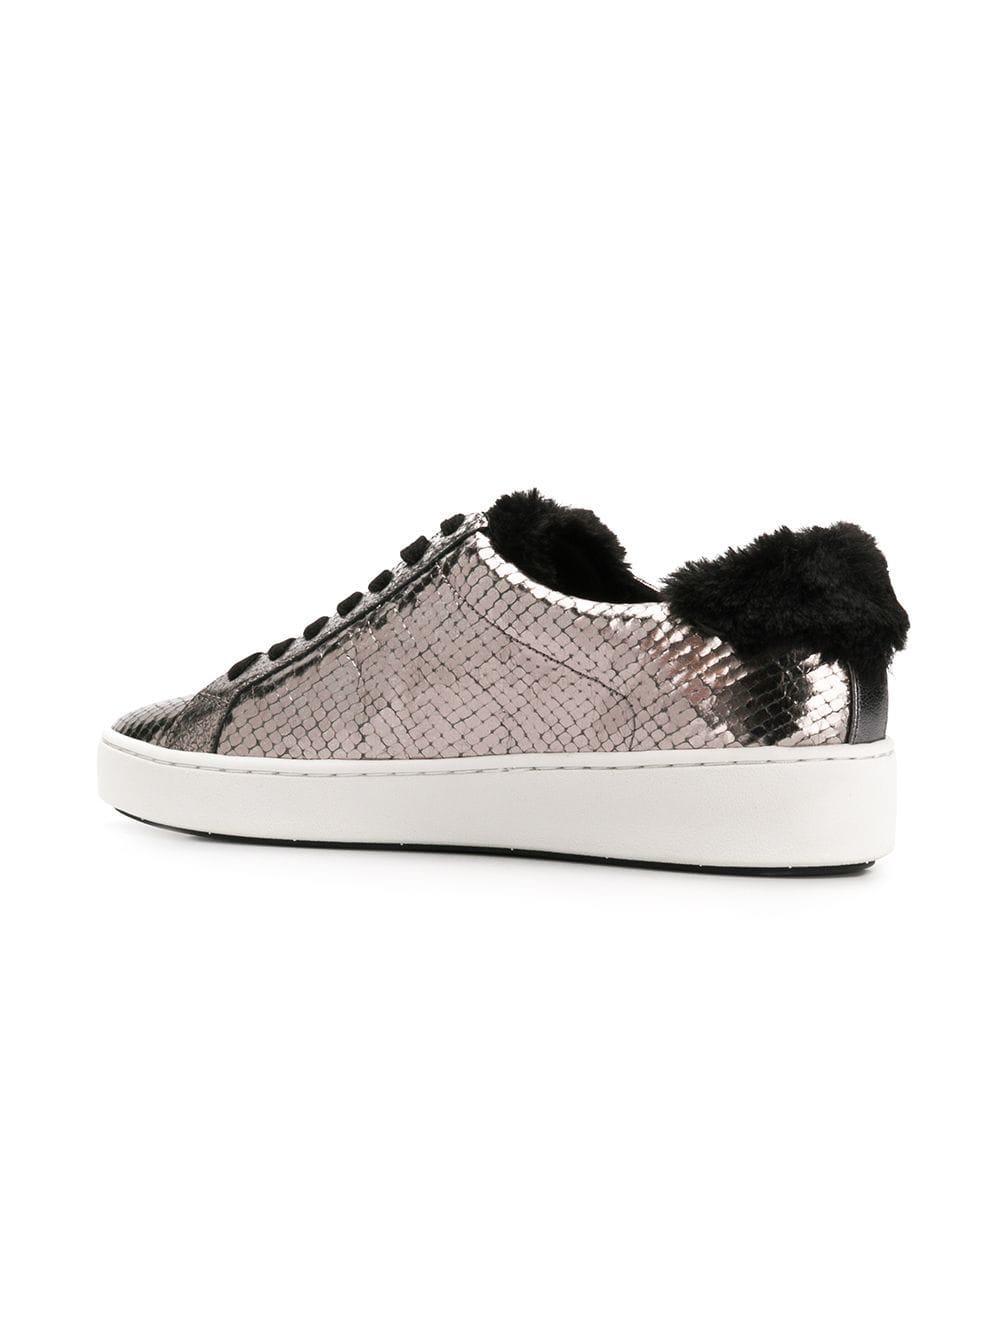 61c9d74b57d4 Lyst - MICHAEL Michael Kors Snakeskin Effect Low-top Sneakers in ...